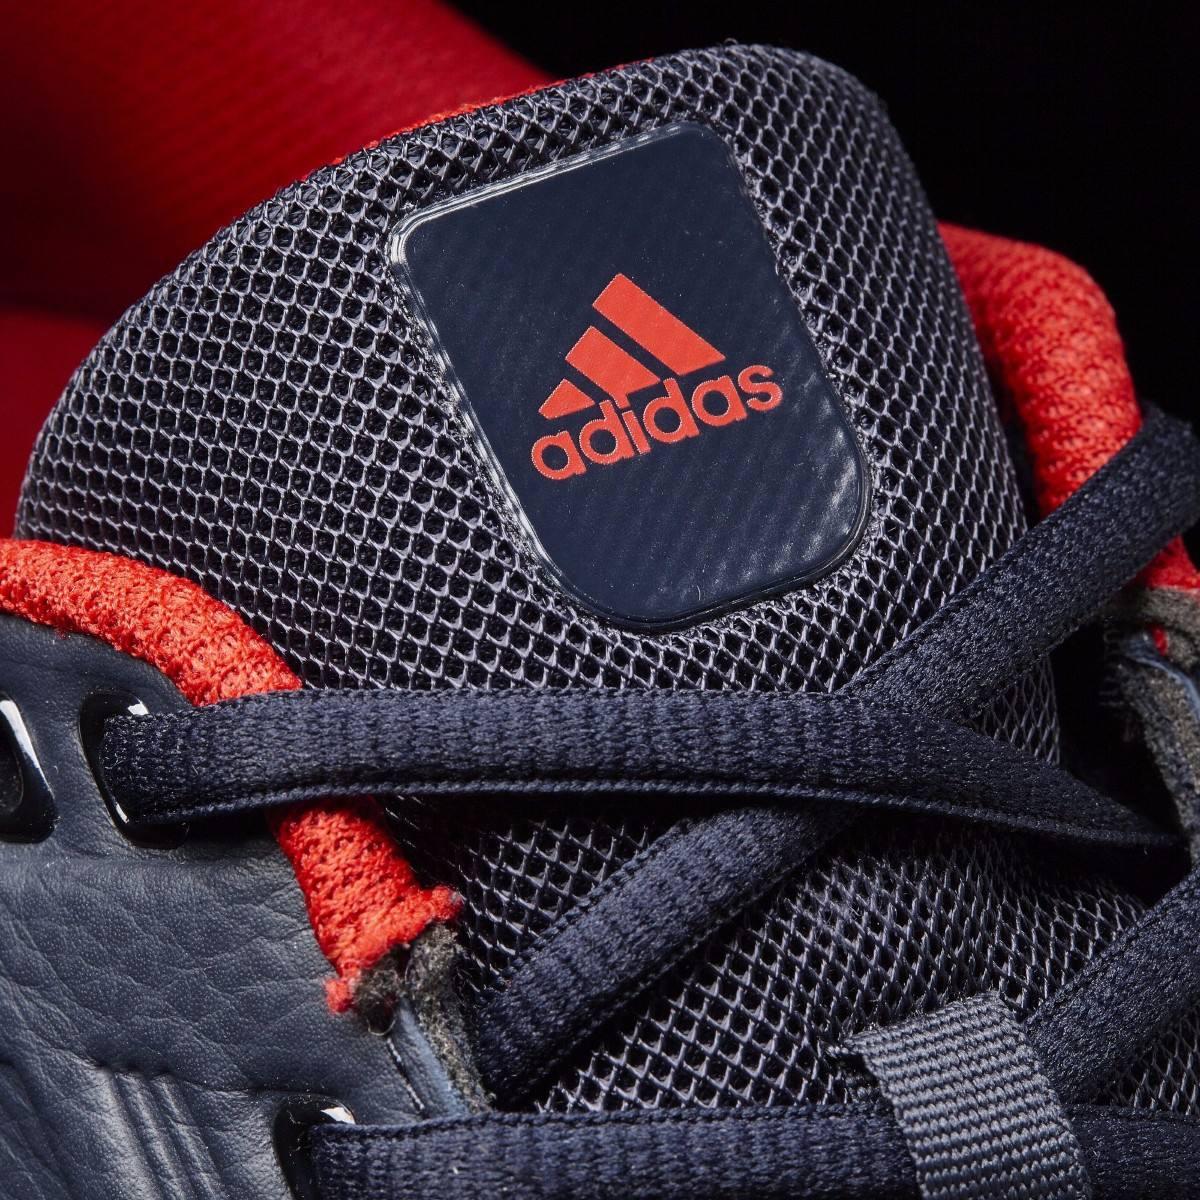 on sale sold worldwide exquisite style JONIWI   Zapatillas adidas Duramo 8 Leather - $ 2.999,00